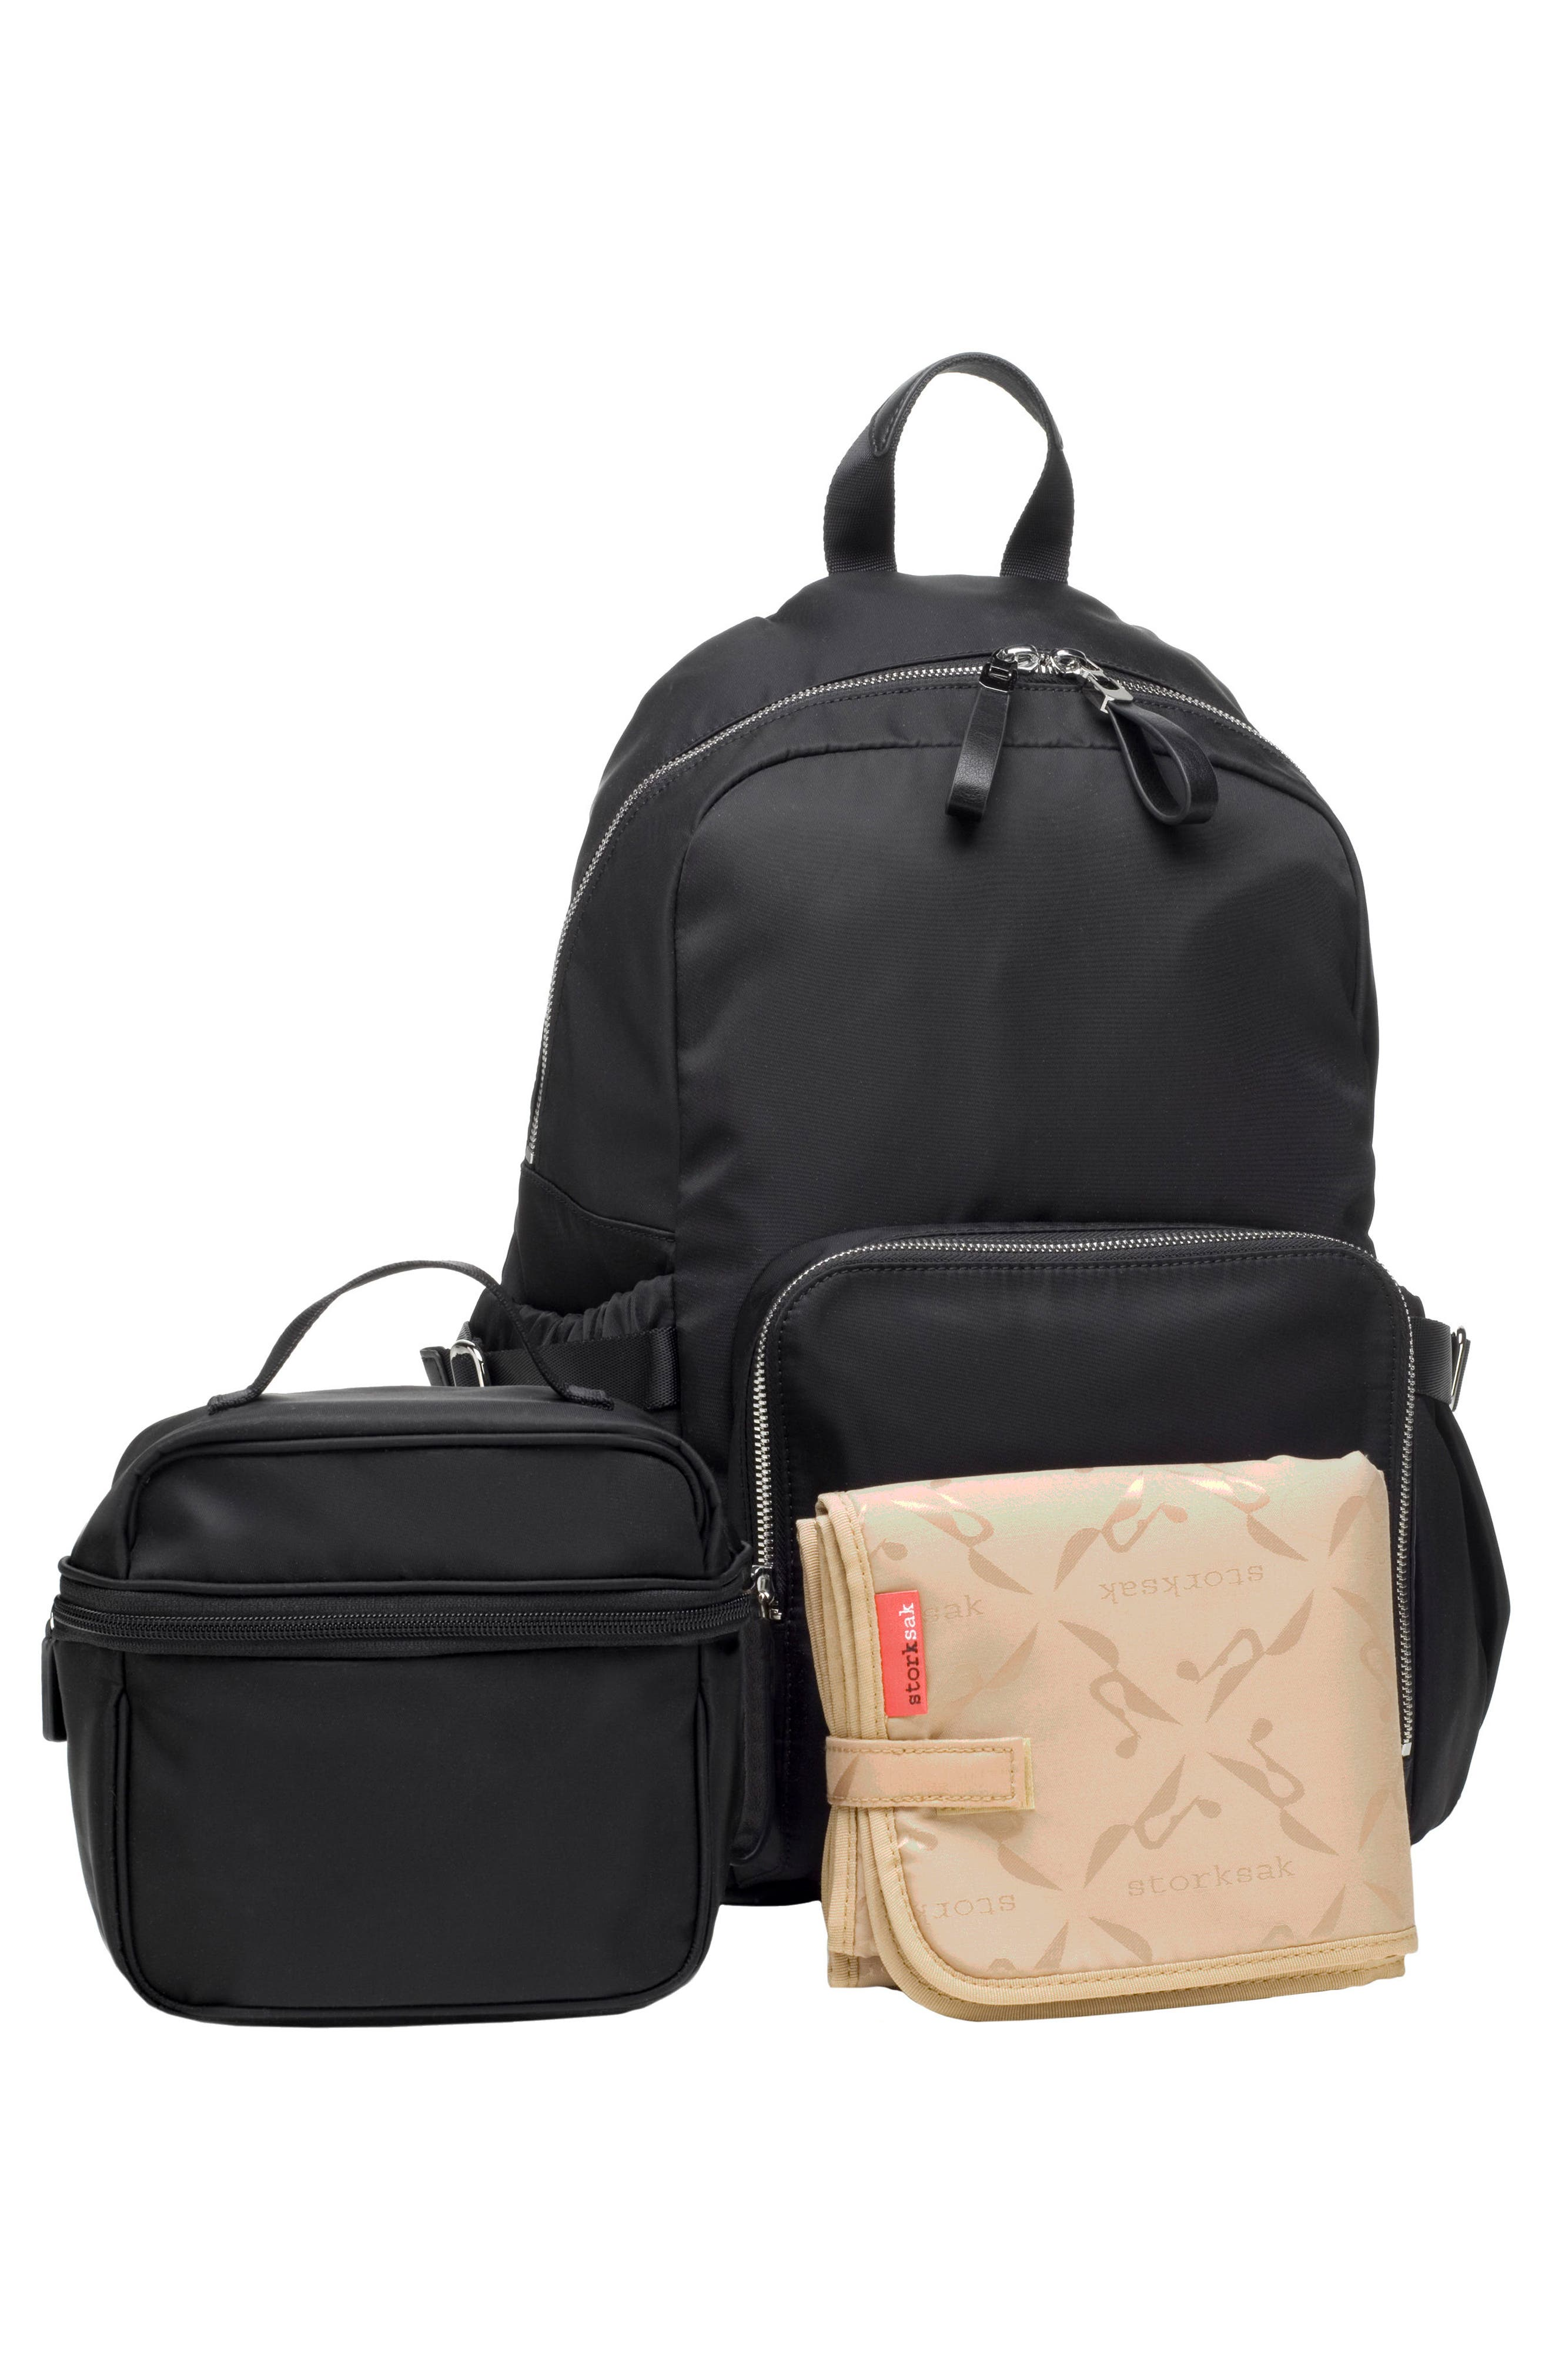 Hero Water Resistant Nylon Backpack Diaper Bag,                             Alternate thumbnail 10, color,                             BLACK